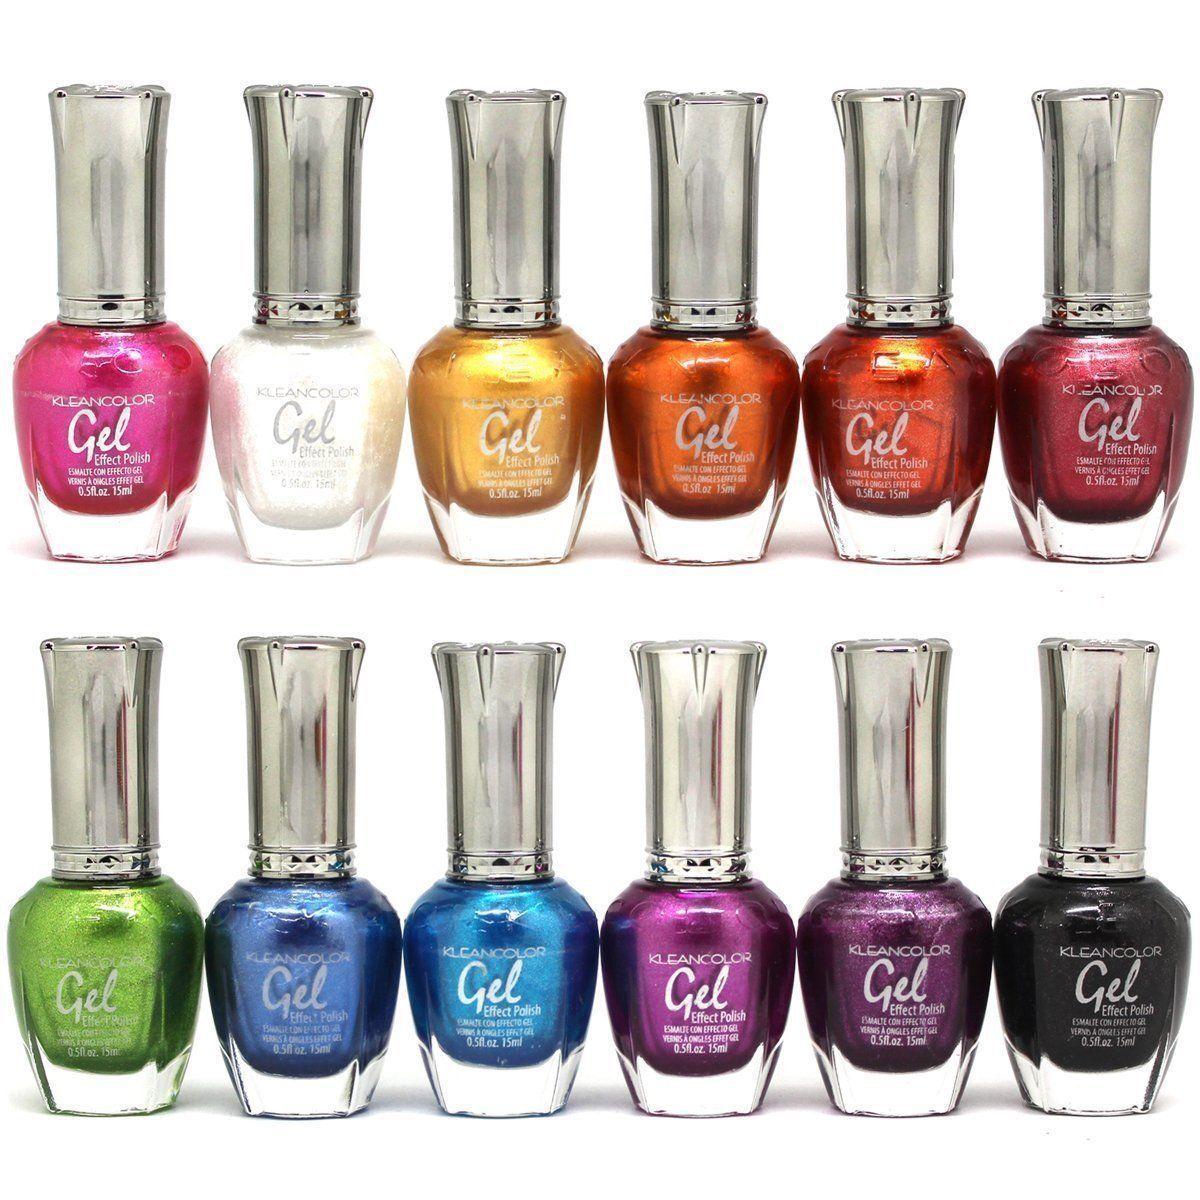 12 Kleancolor GEL NO UV LED Nail Polish Lacquer 15mL Choose